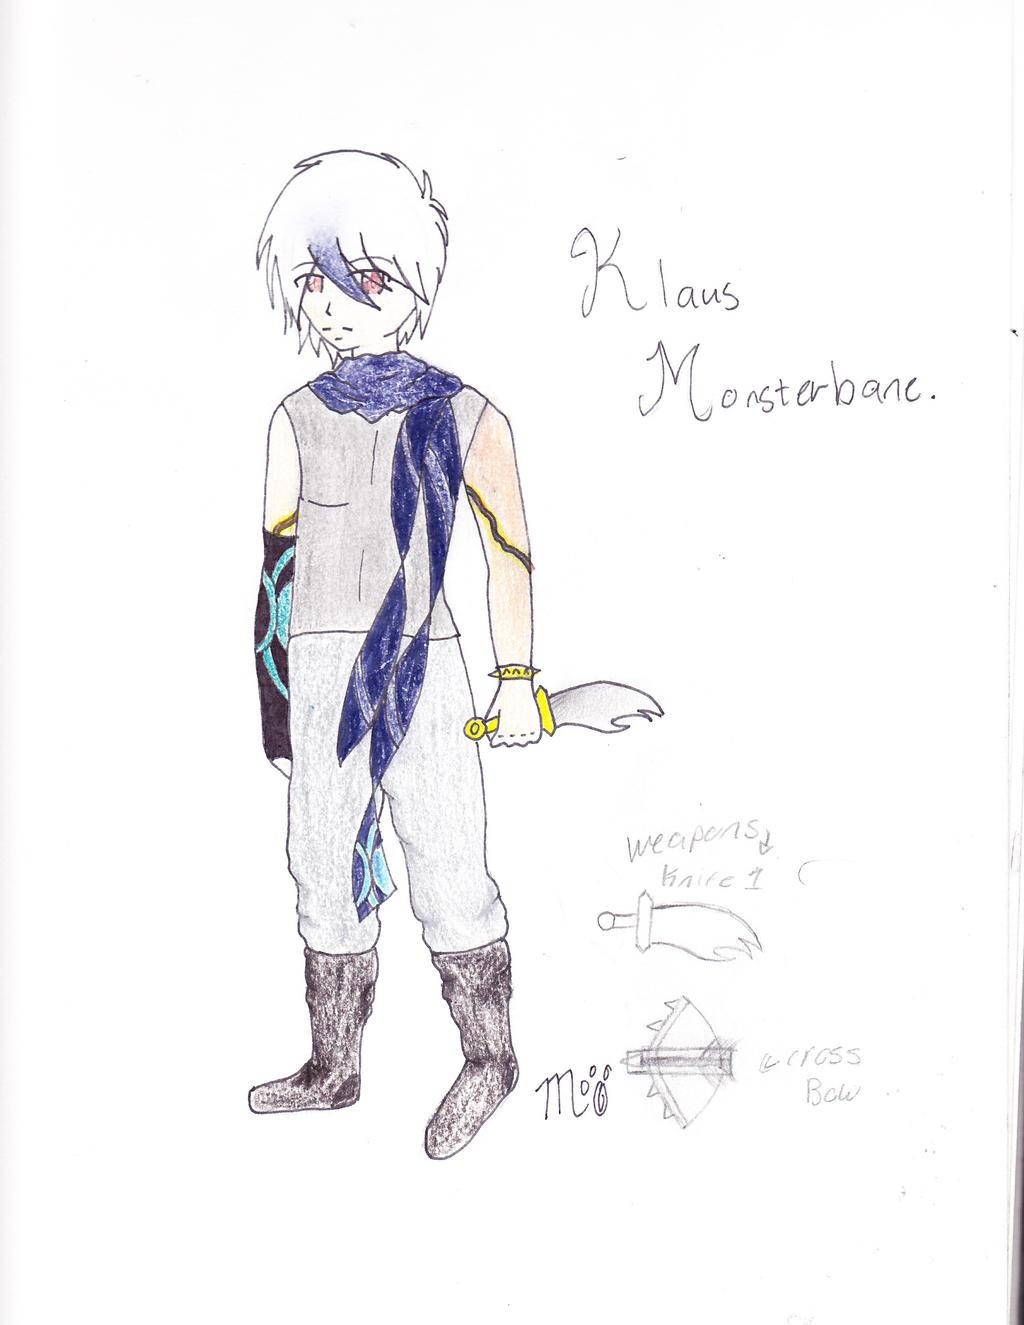 Kalus Monsterbane by EmpatheticMortalAnge